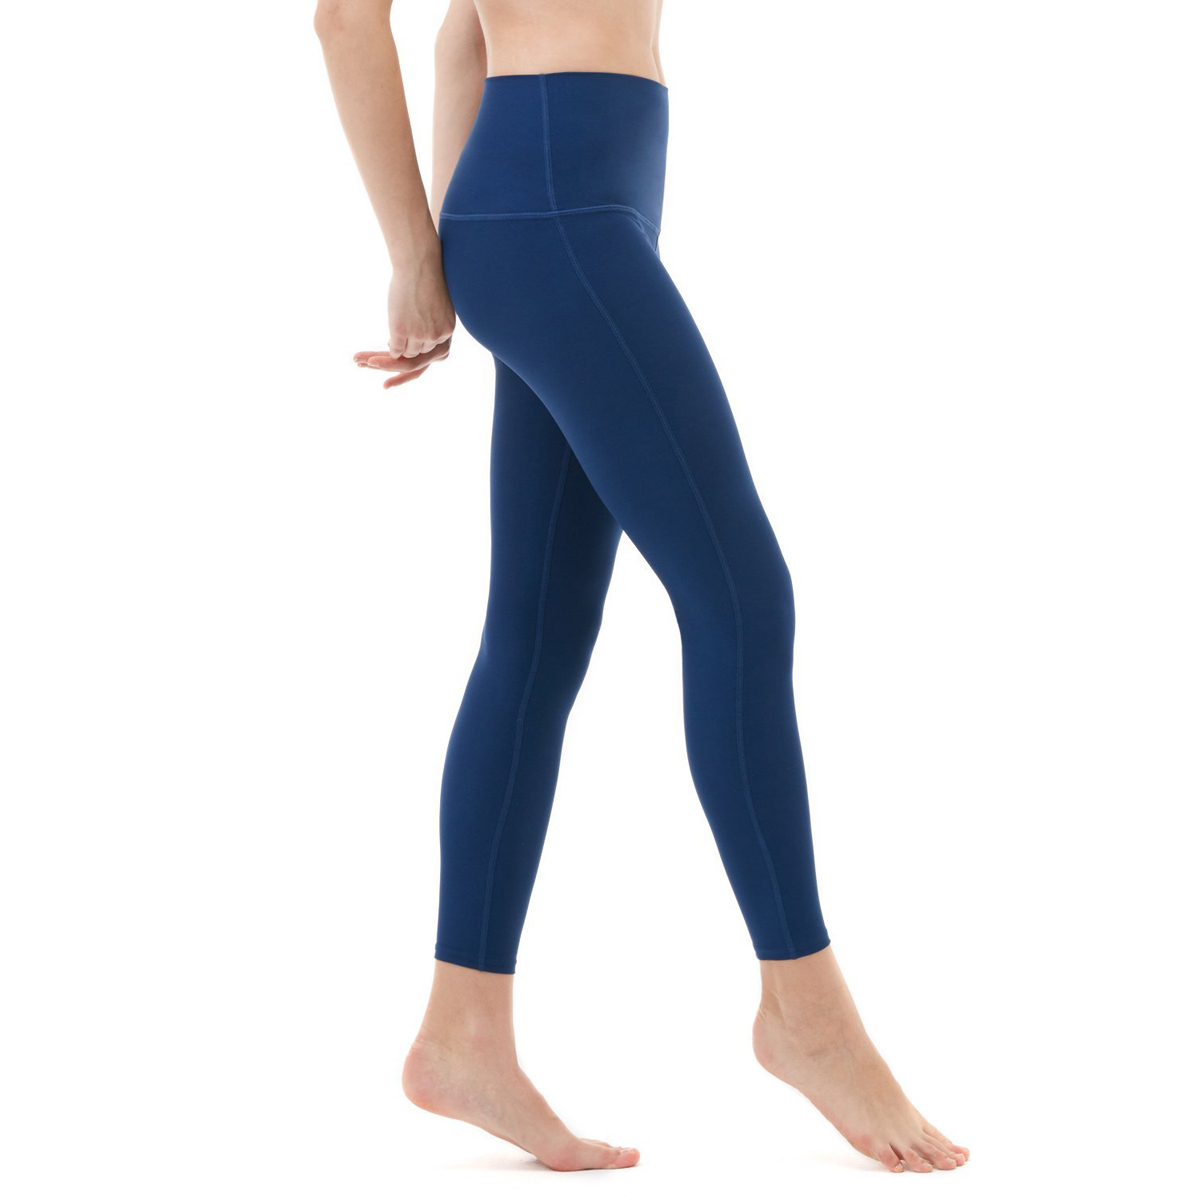 thumbnail 46 - TSLA Tesla FYP42 Women's High-Waisted Ultra-Stretch Tummy Control Yoga Pants